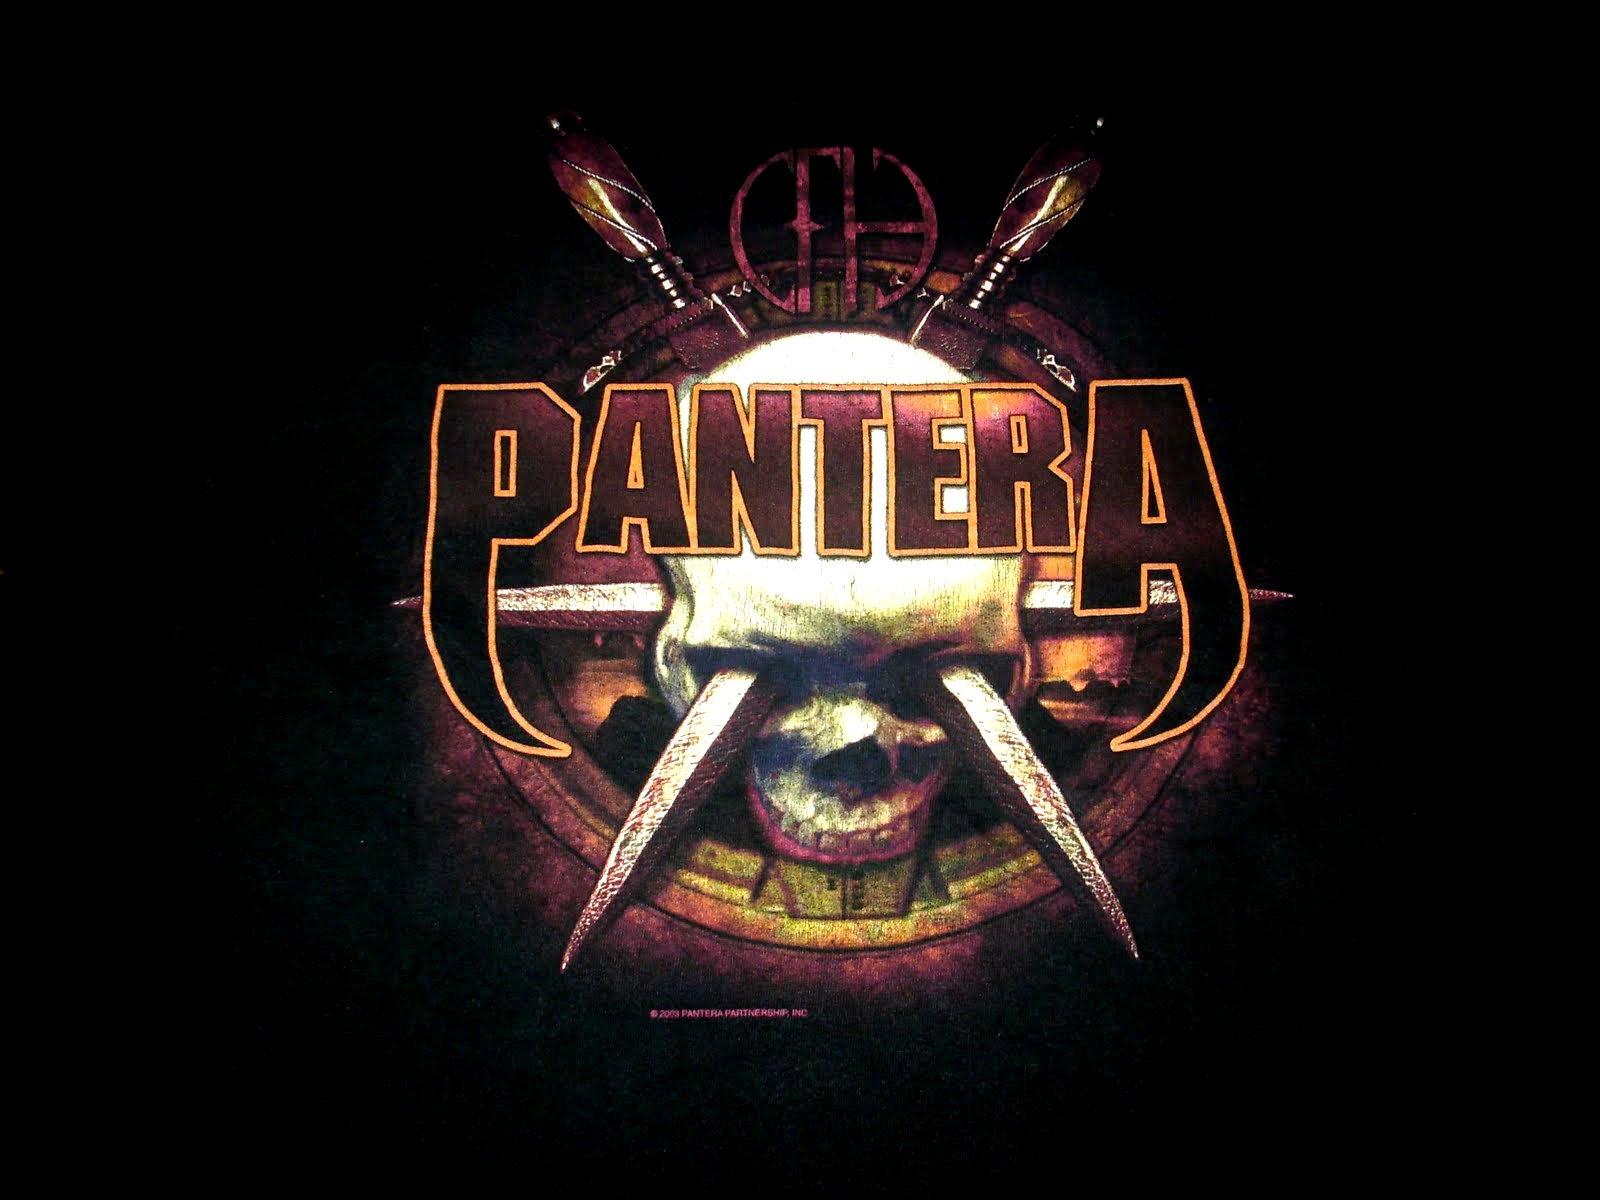 PANTERA thrash metal heavy dark skull g wallpaper 1600x1200 302655 1600x1200